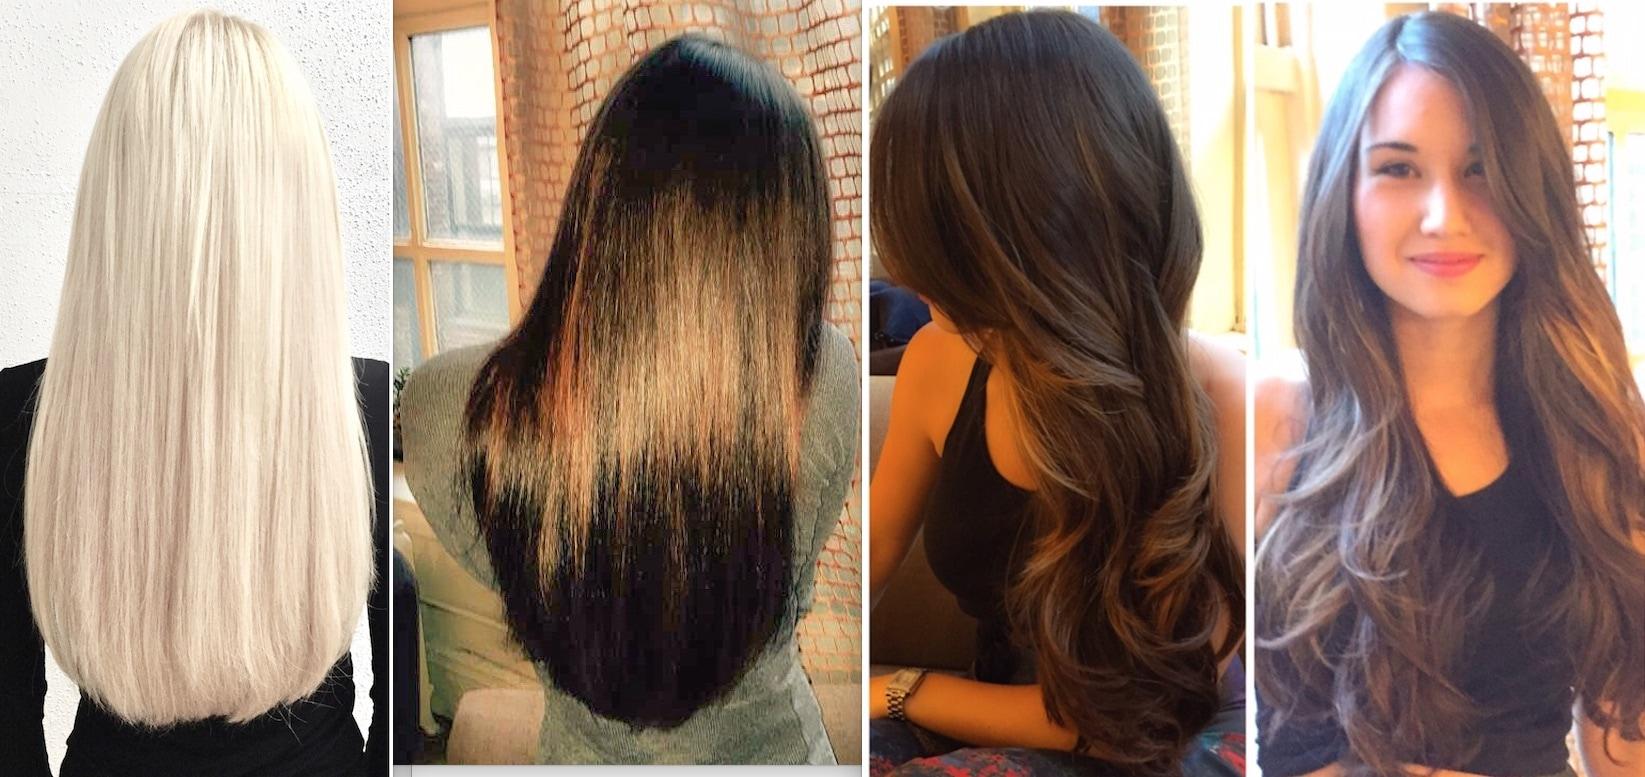 In NYC Great Lengths Hair Extension Specialist Devon Nola